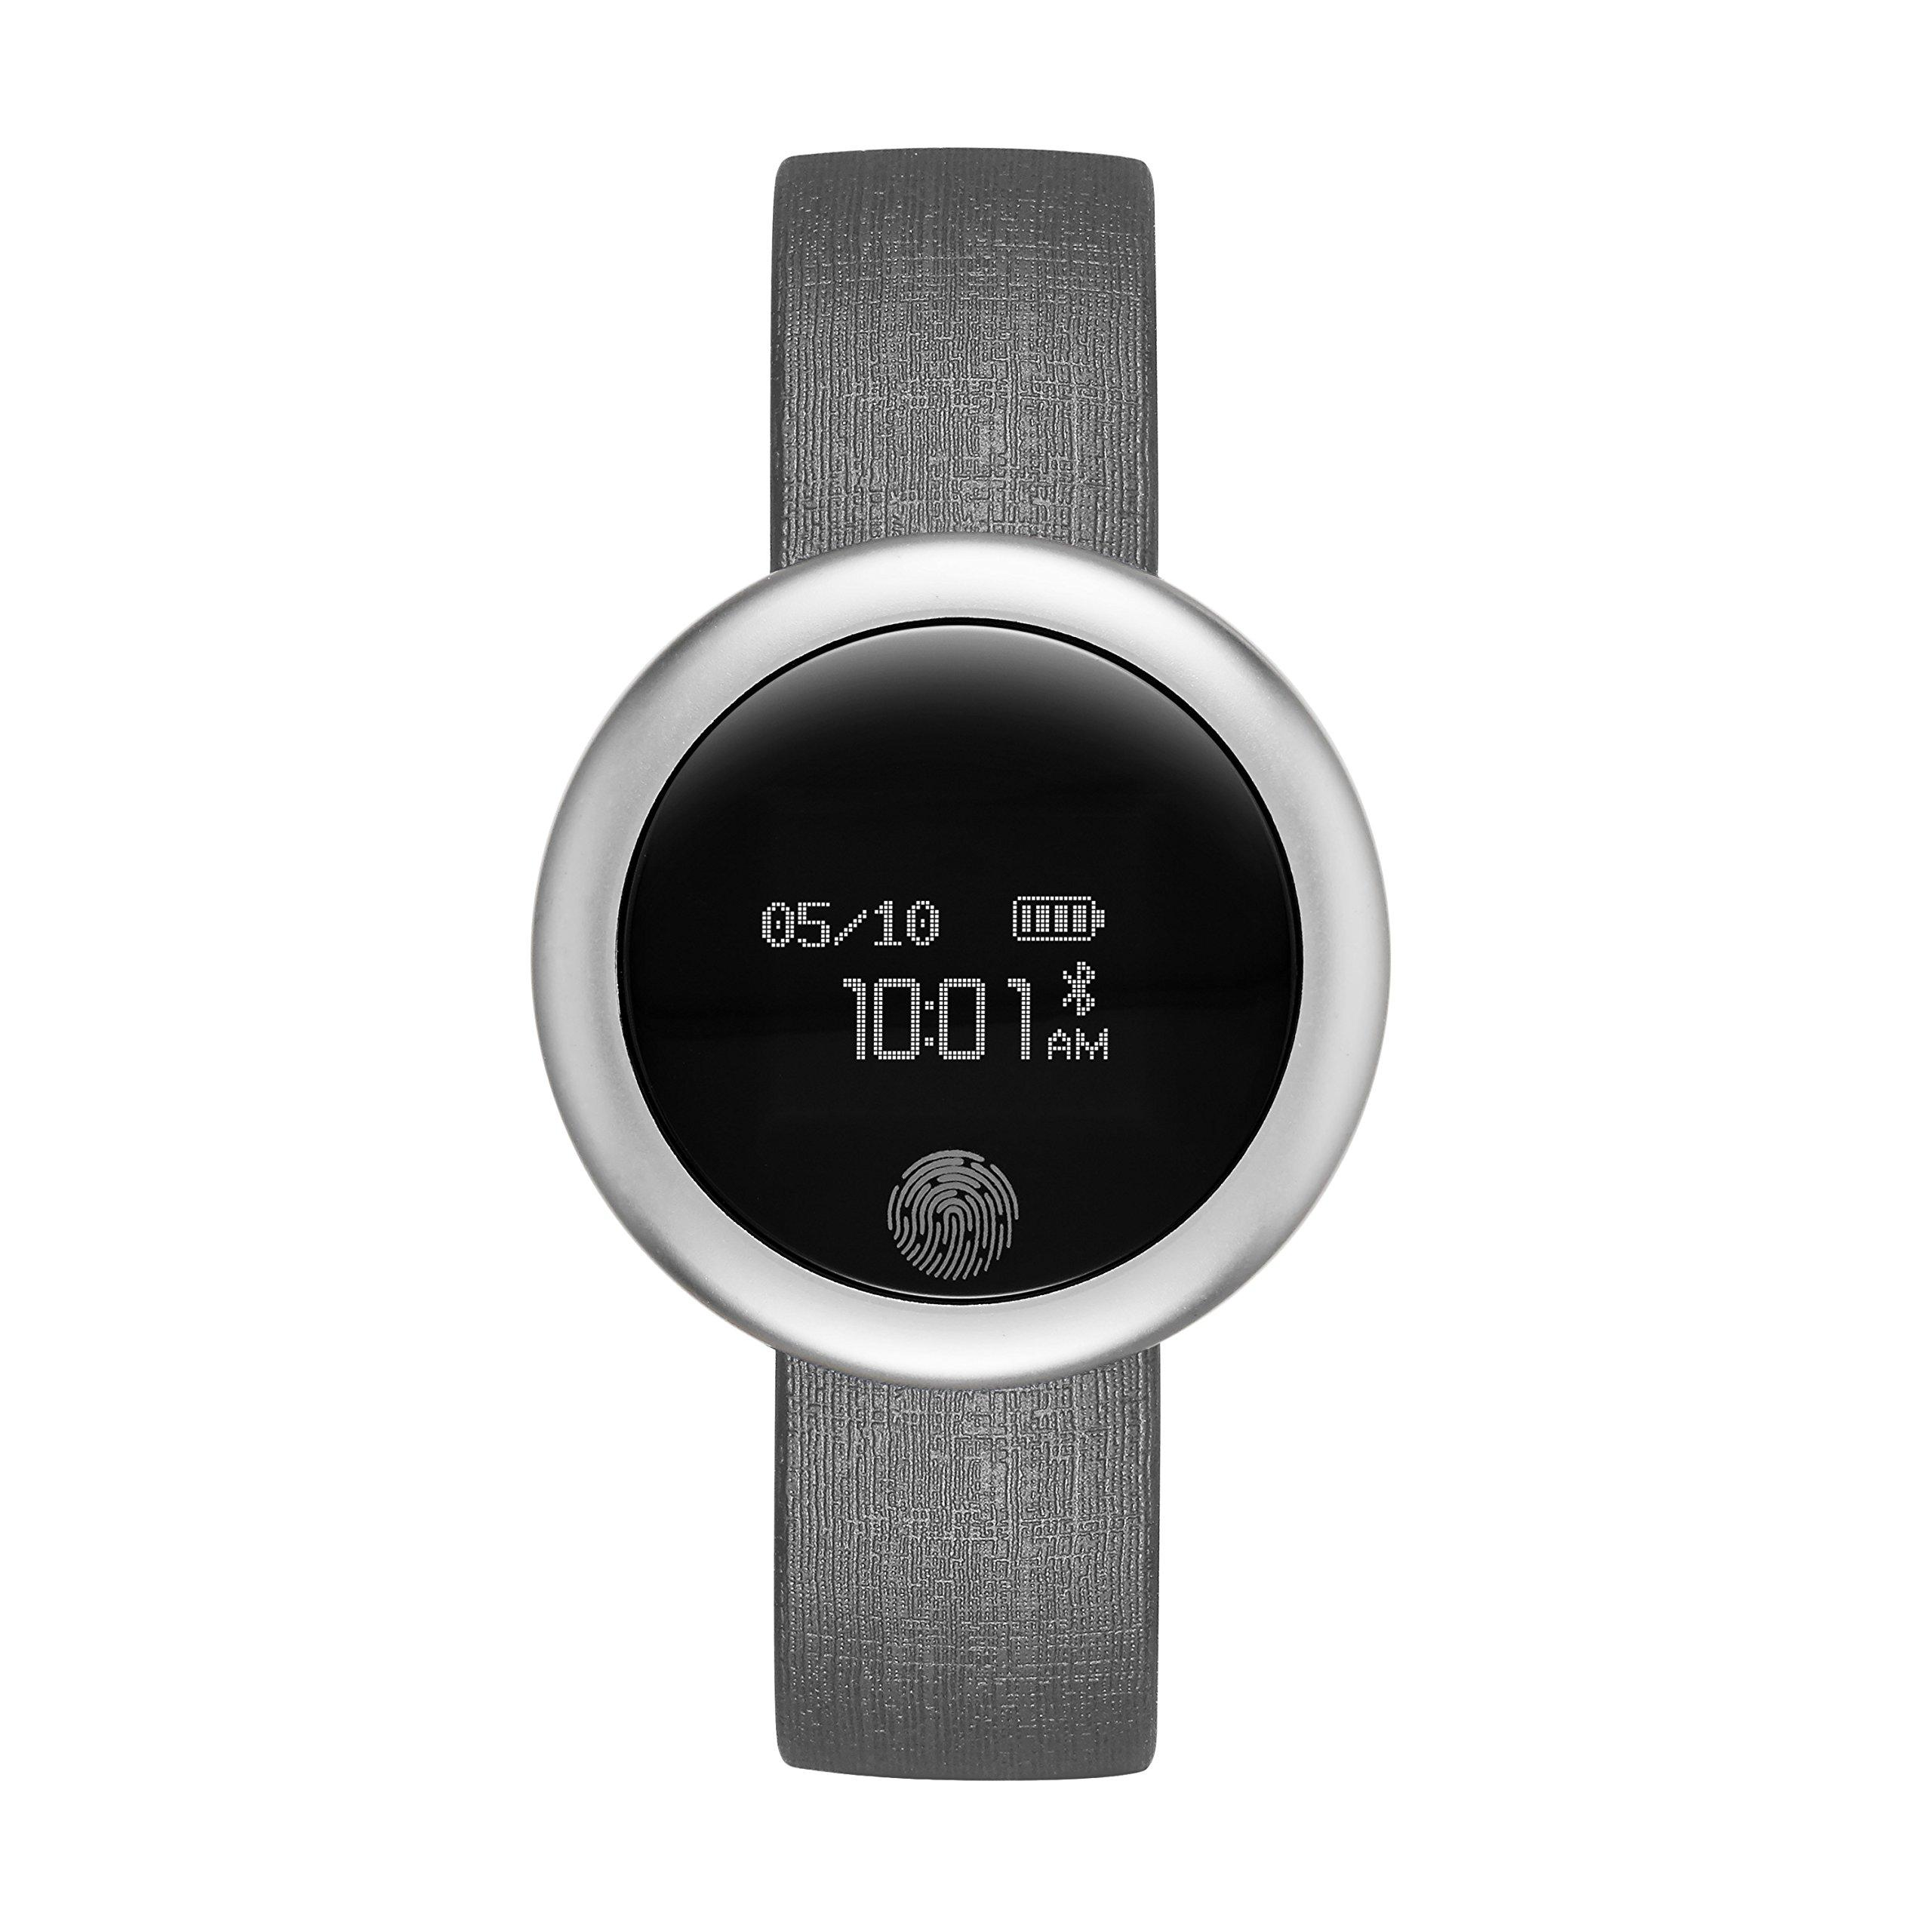 Emotion Unisex Metal and Rubber Smartwatch, Color: Silver-Tone, Grey (Model: FMDEM001) by eMotion